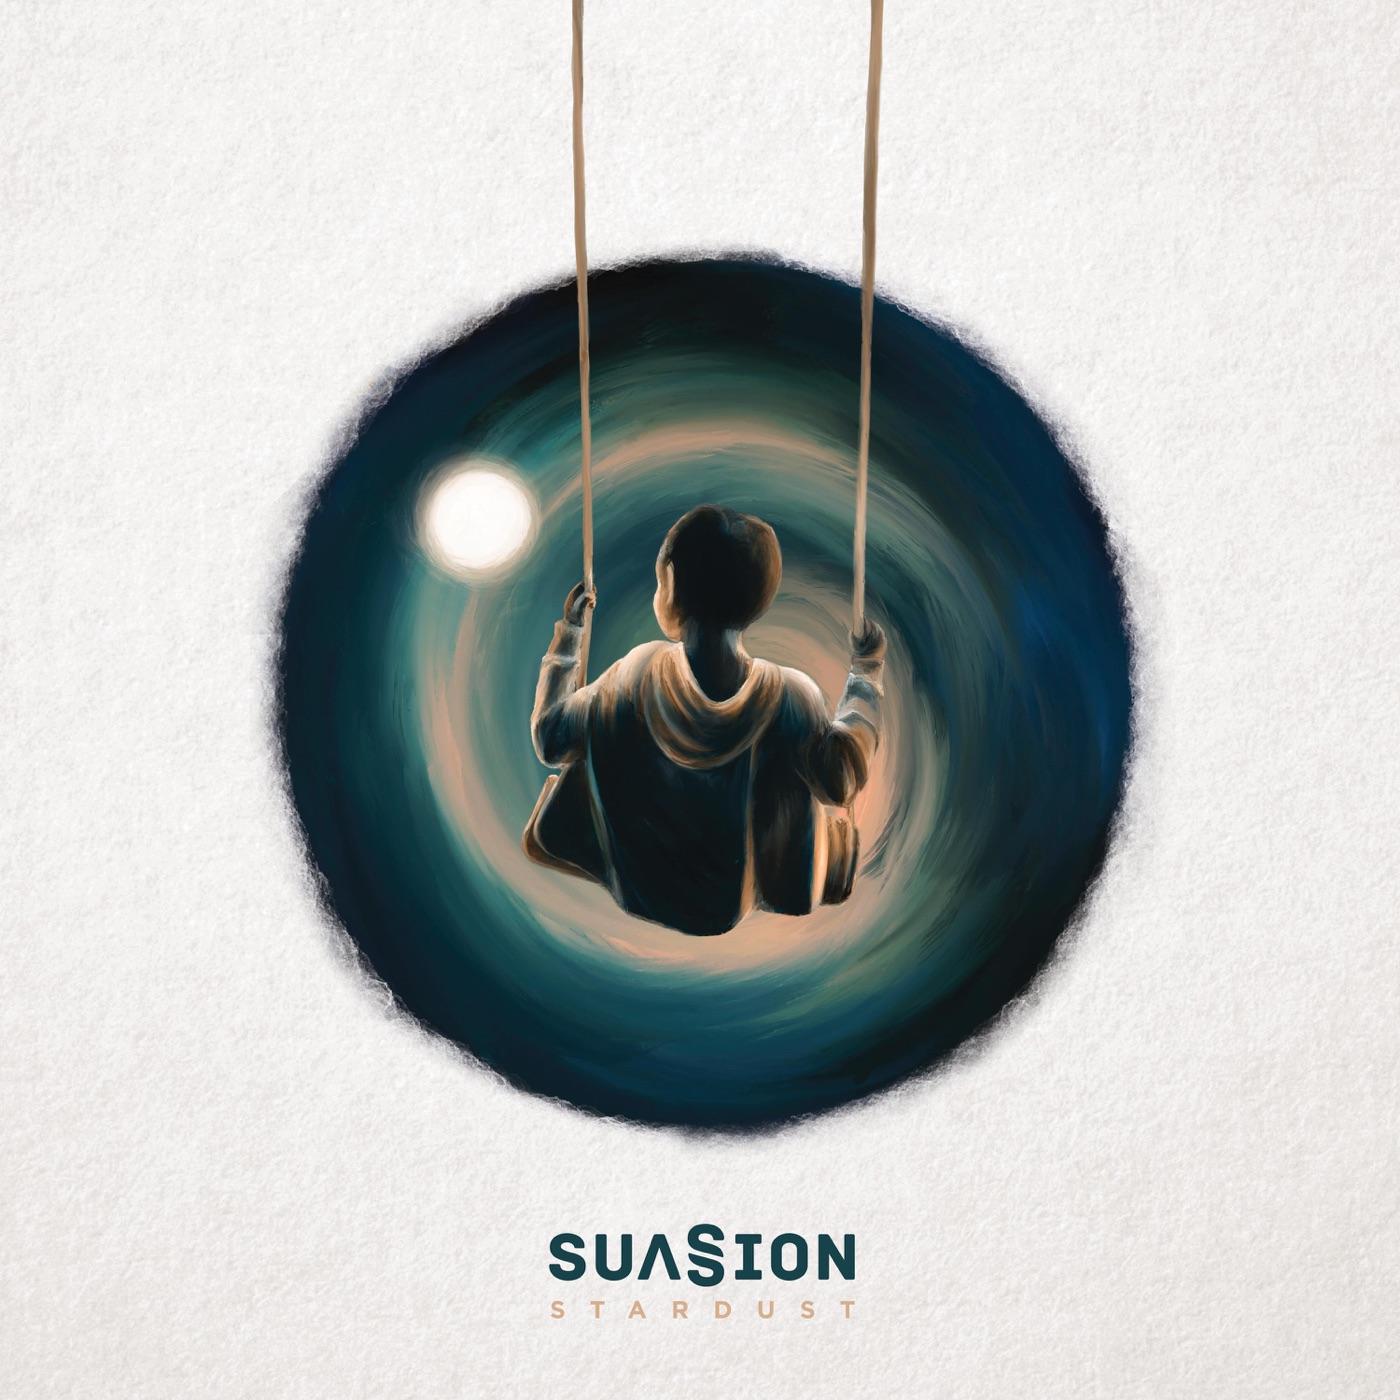 Suasion - Stardust (2019)